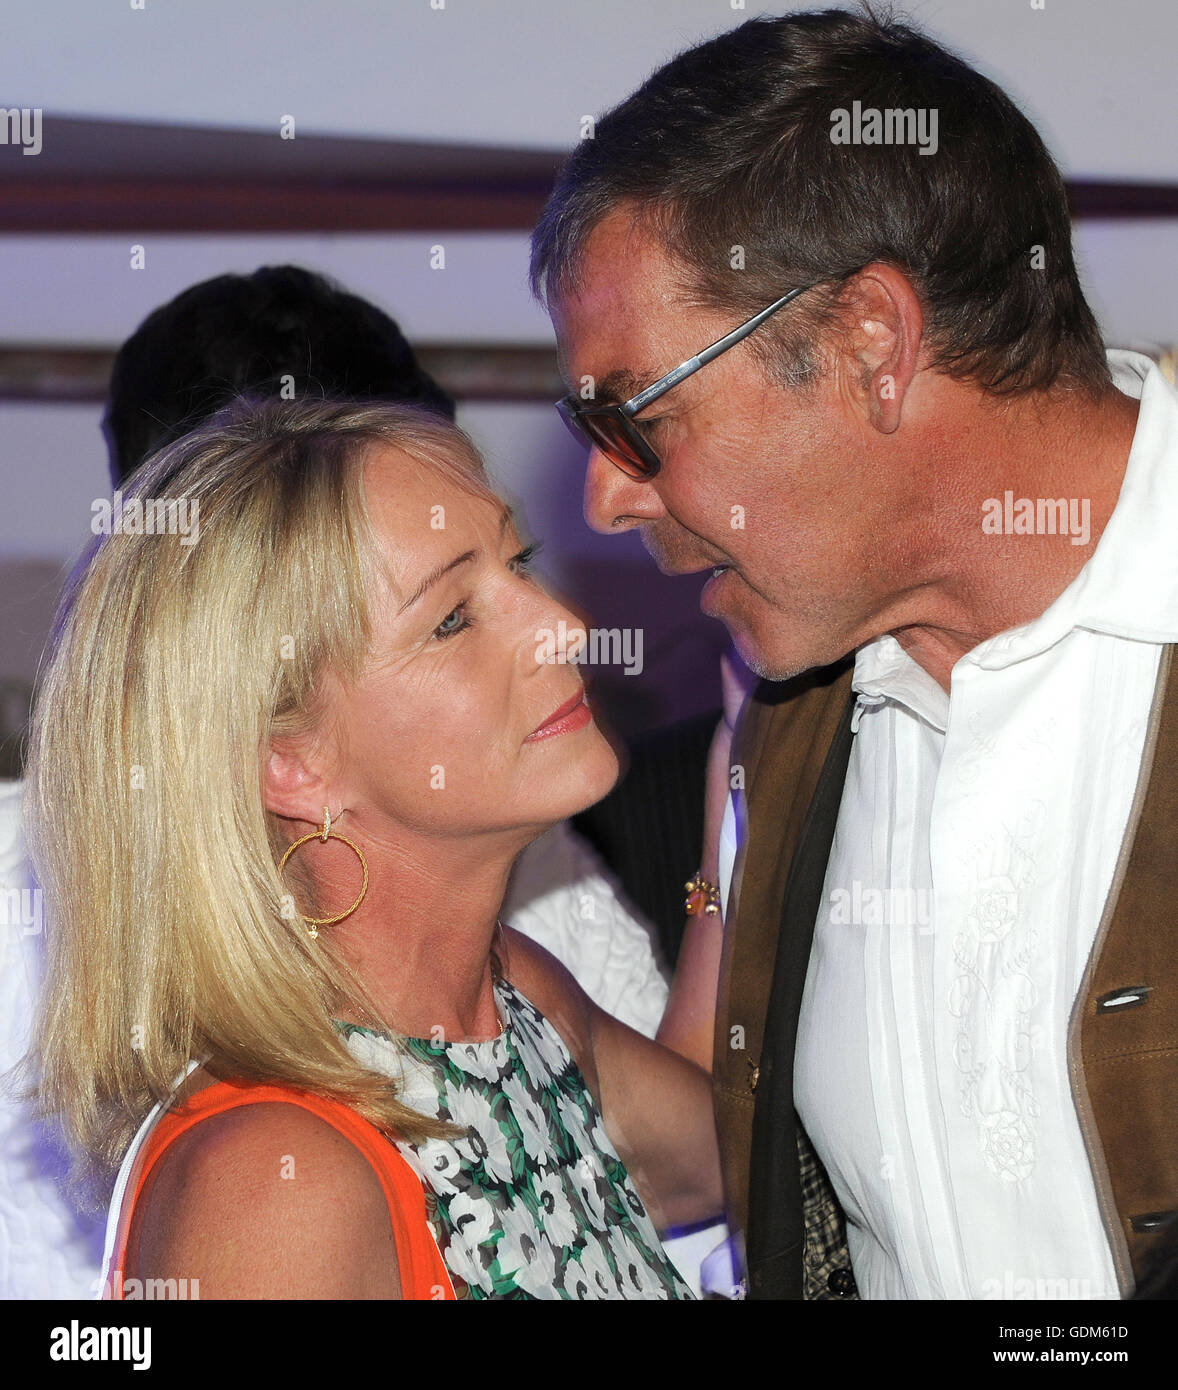 Sascha hehn verheiratet